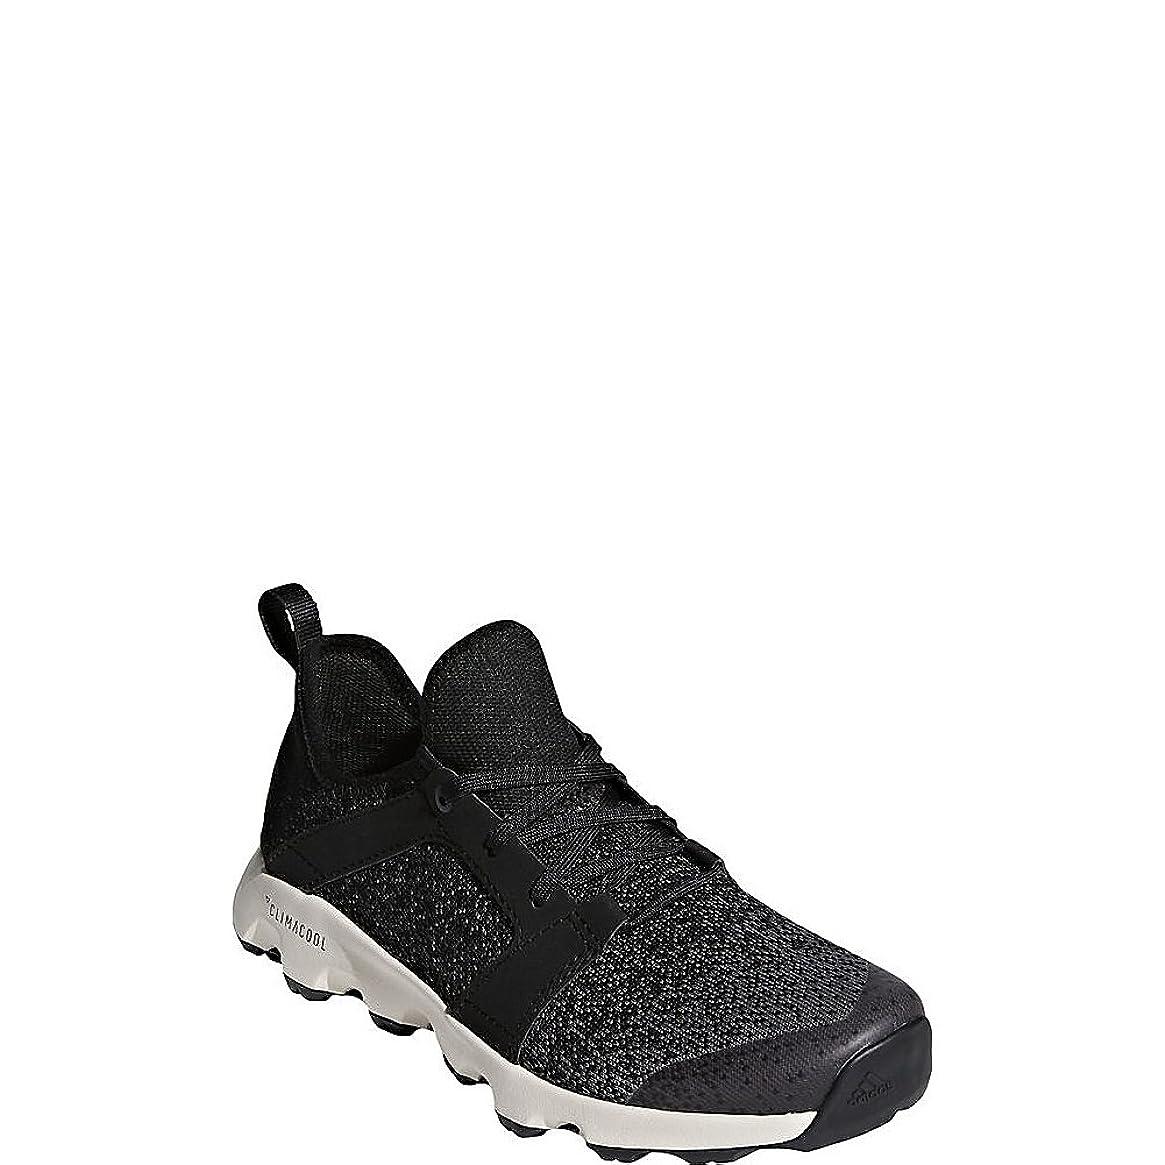 adidas outdoor Women's Terrex CC Voyager Sleek Parley Black/Grey Four/Chalk White 6.5 B US